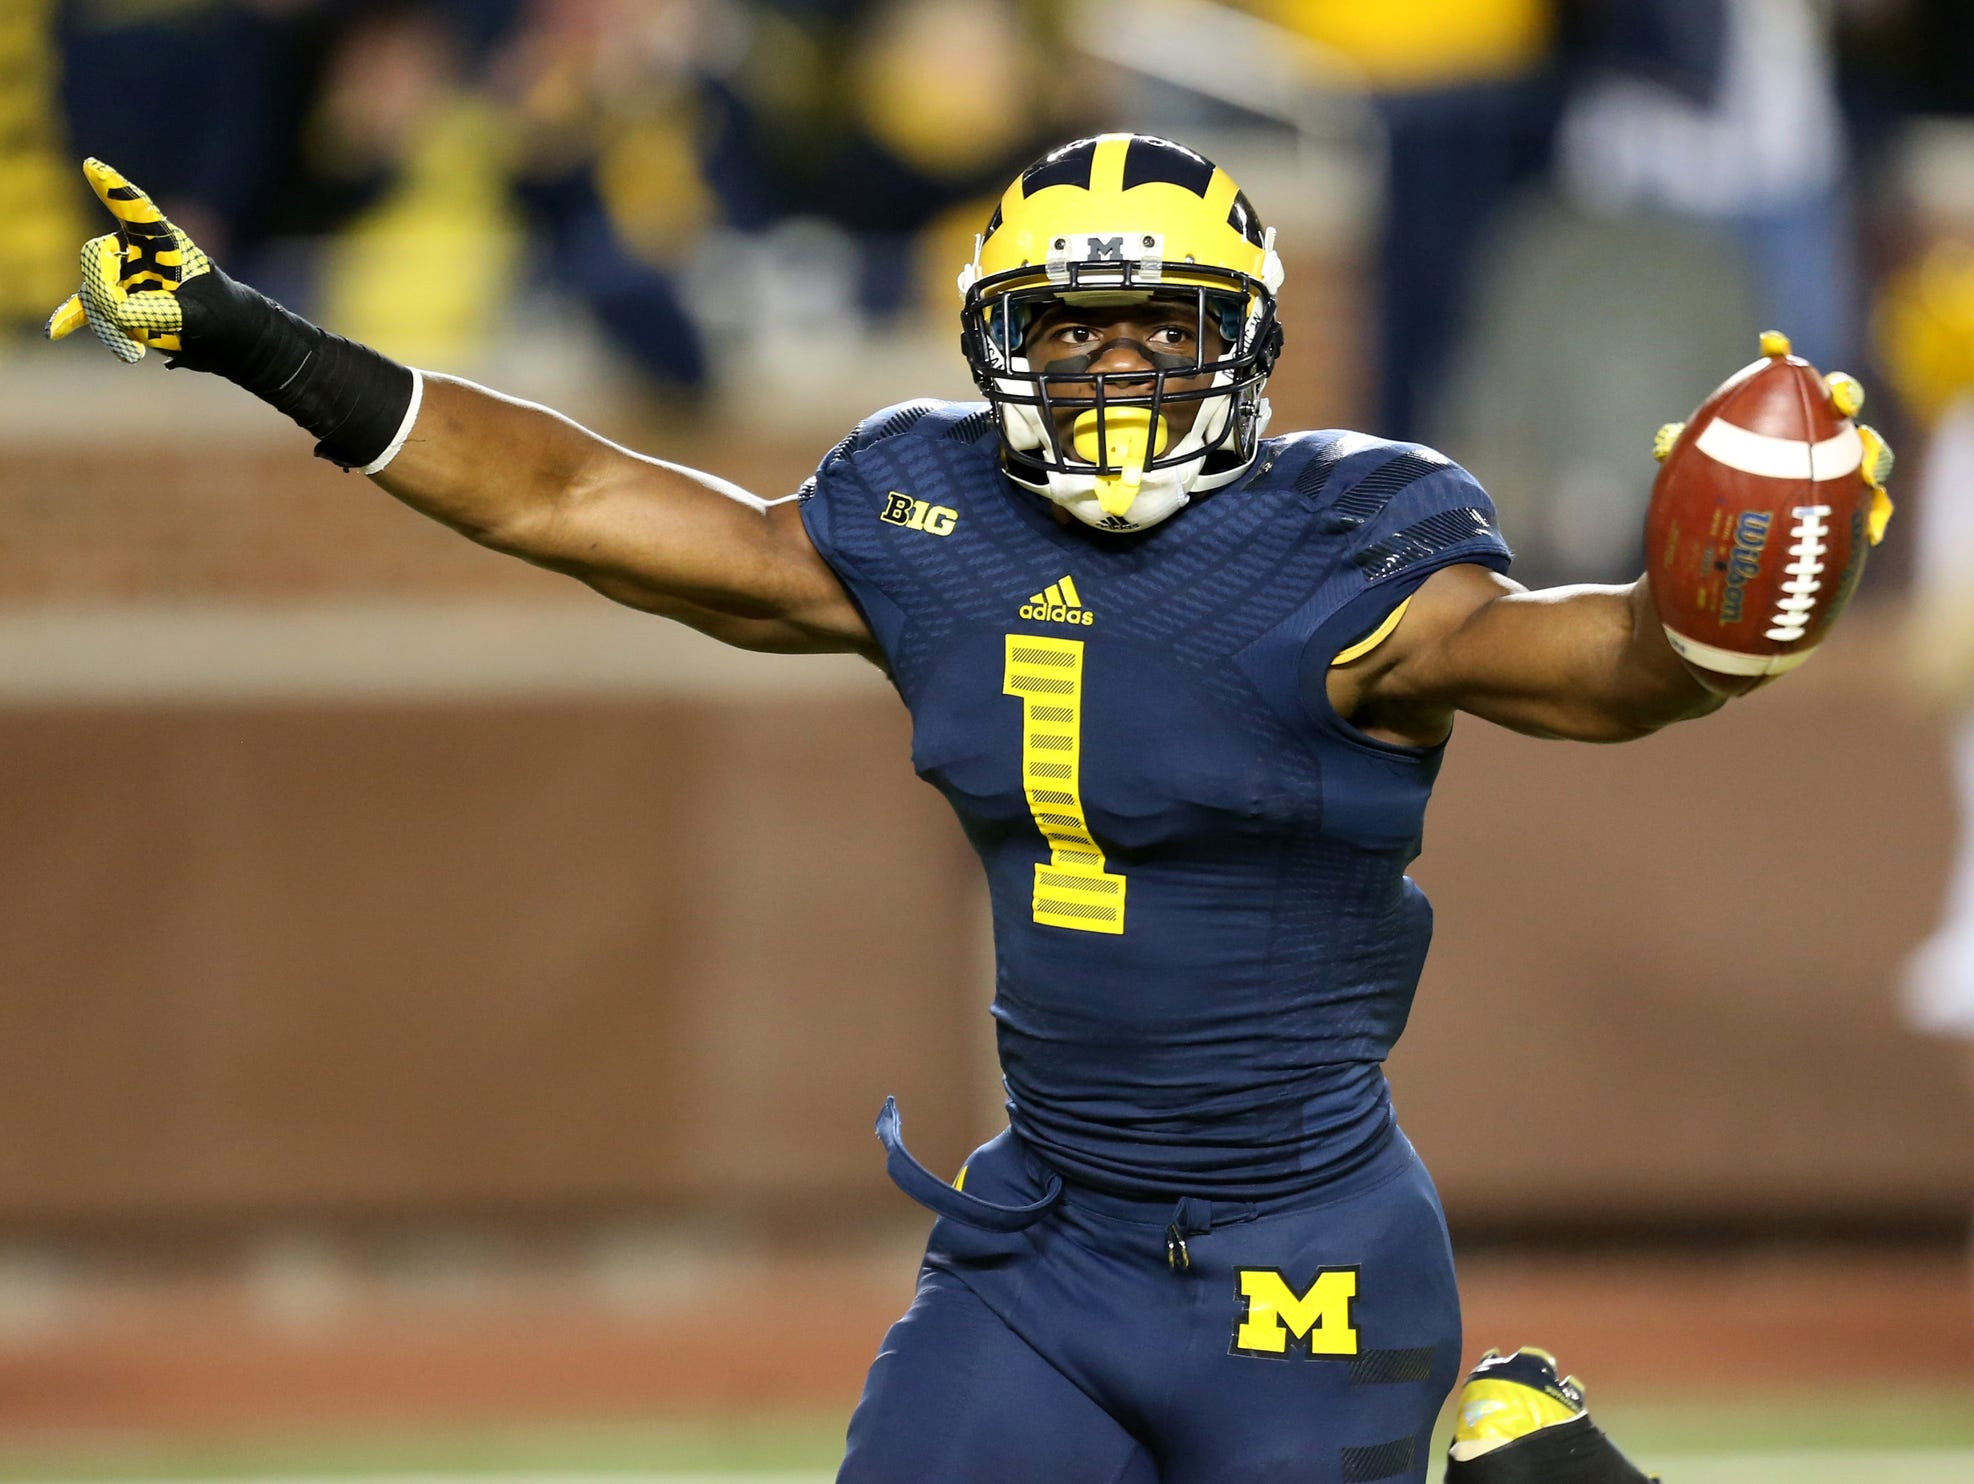 Devin Funchess of Farmington Hills catches a touchdown pass in Michigan Stadium.